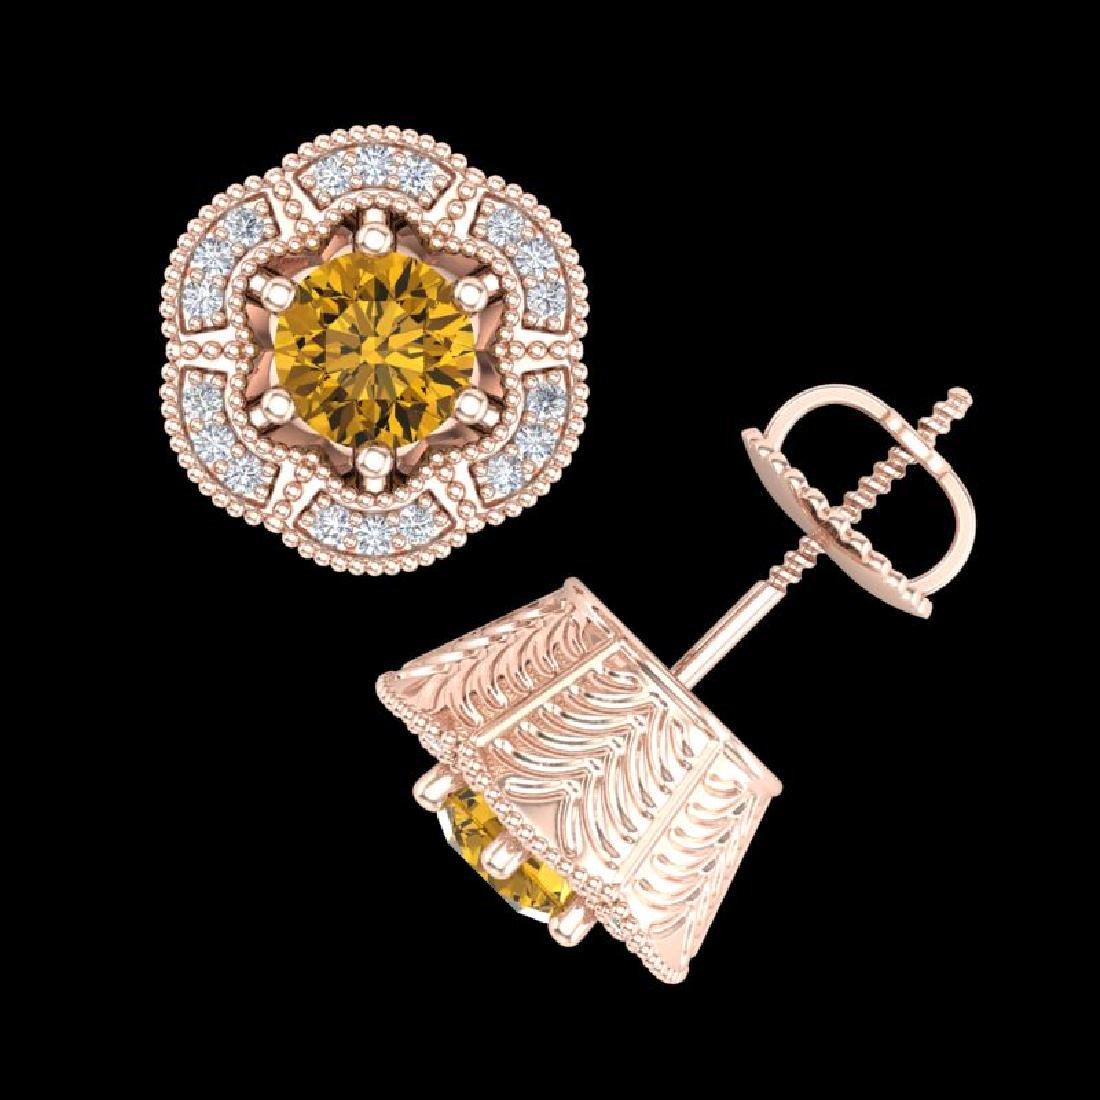 1.51 CTW Intense Fancy Yellow Diamond Art Deco Stud - 3